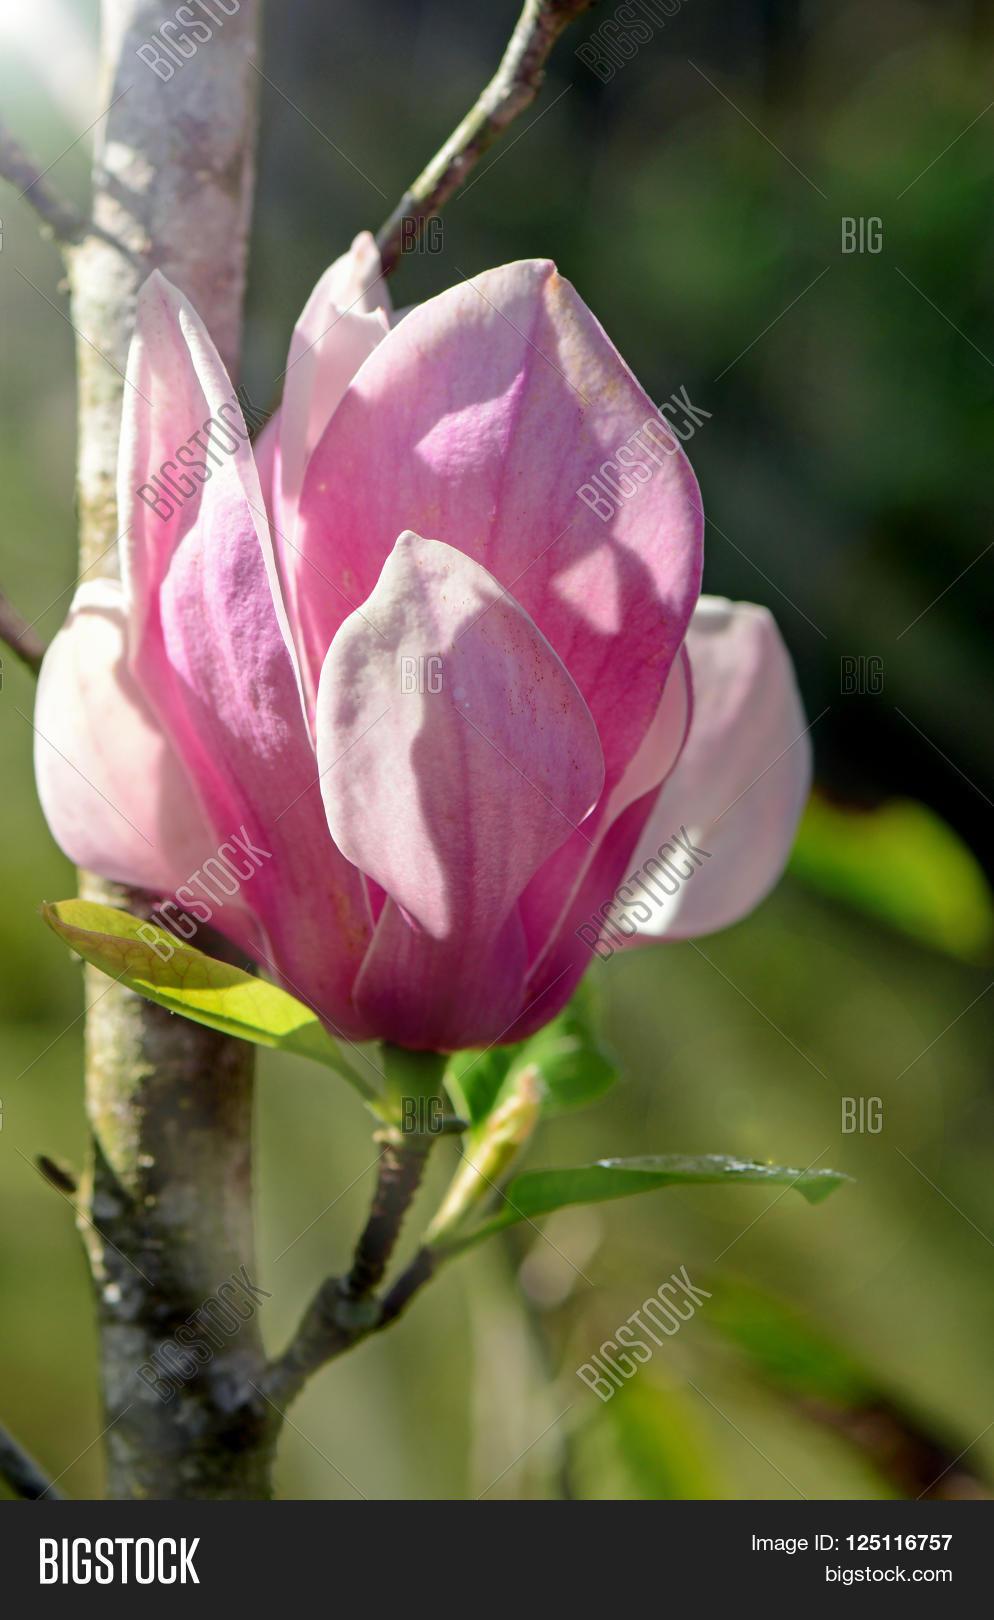 Pink Magnolia Image Photo Free Trial Bigstock